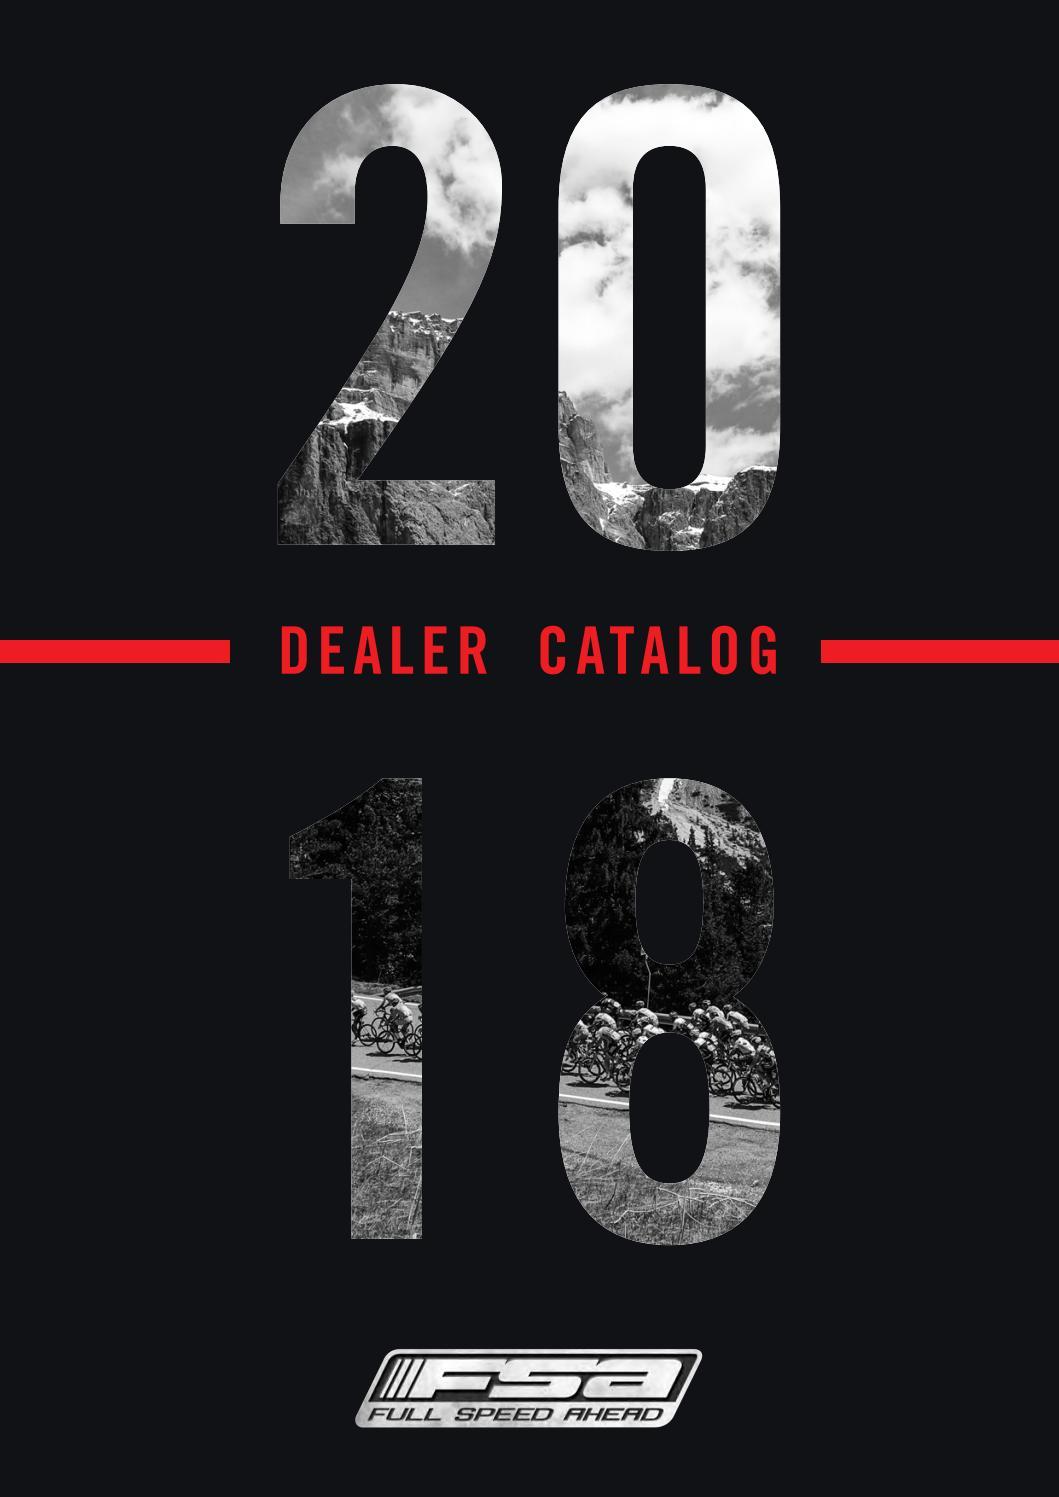 hight resolution of 2018 dealer catalog fsa vision metropolis by fsa full speed ahead issuu